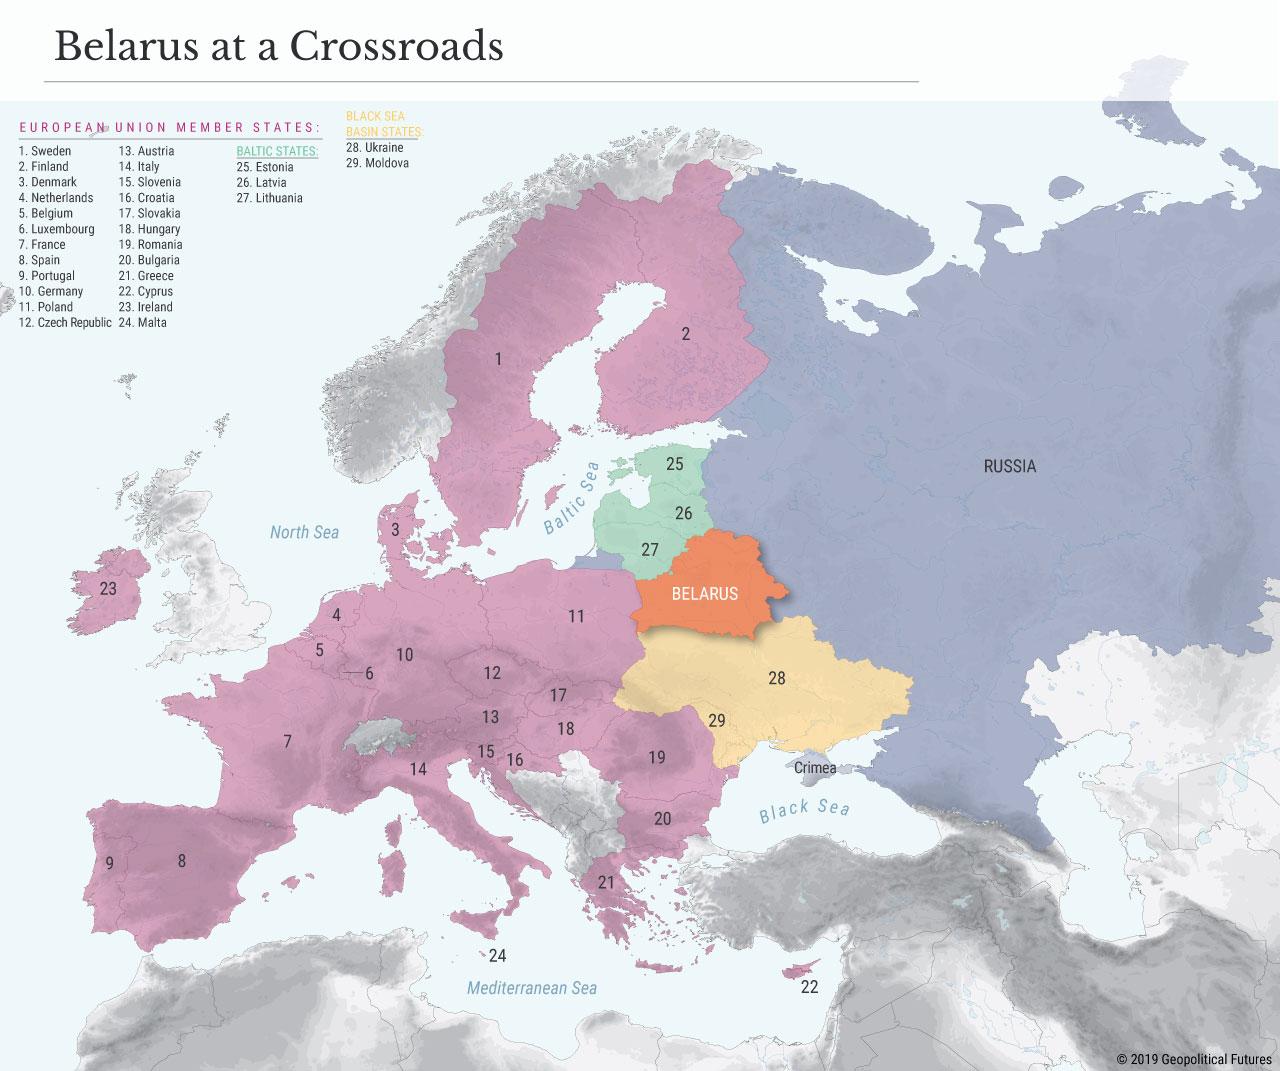 Belarus at a Crossroads